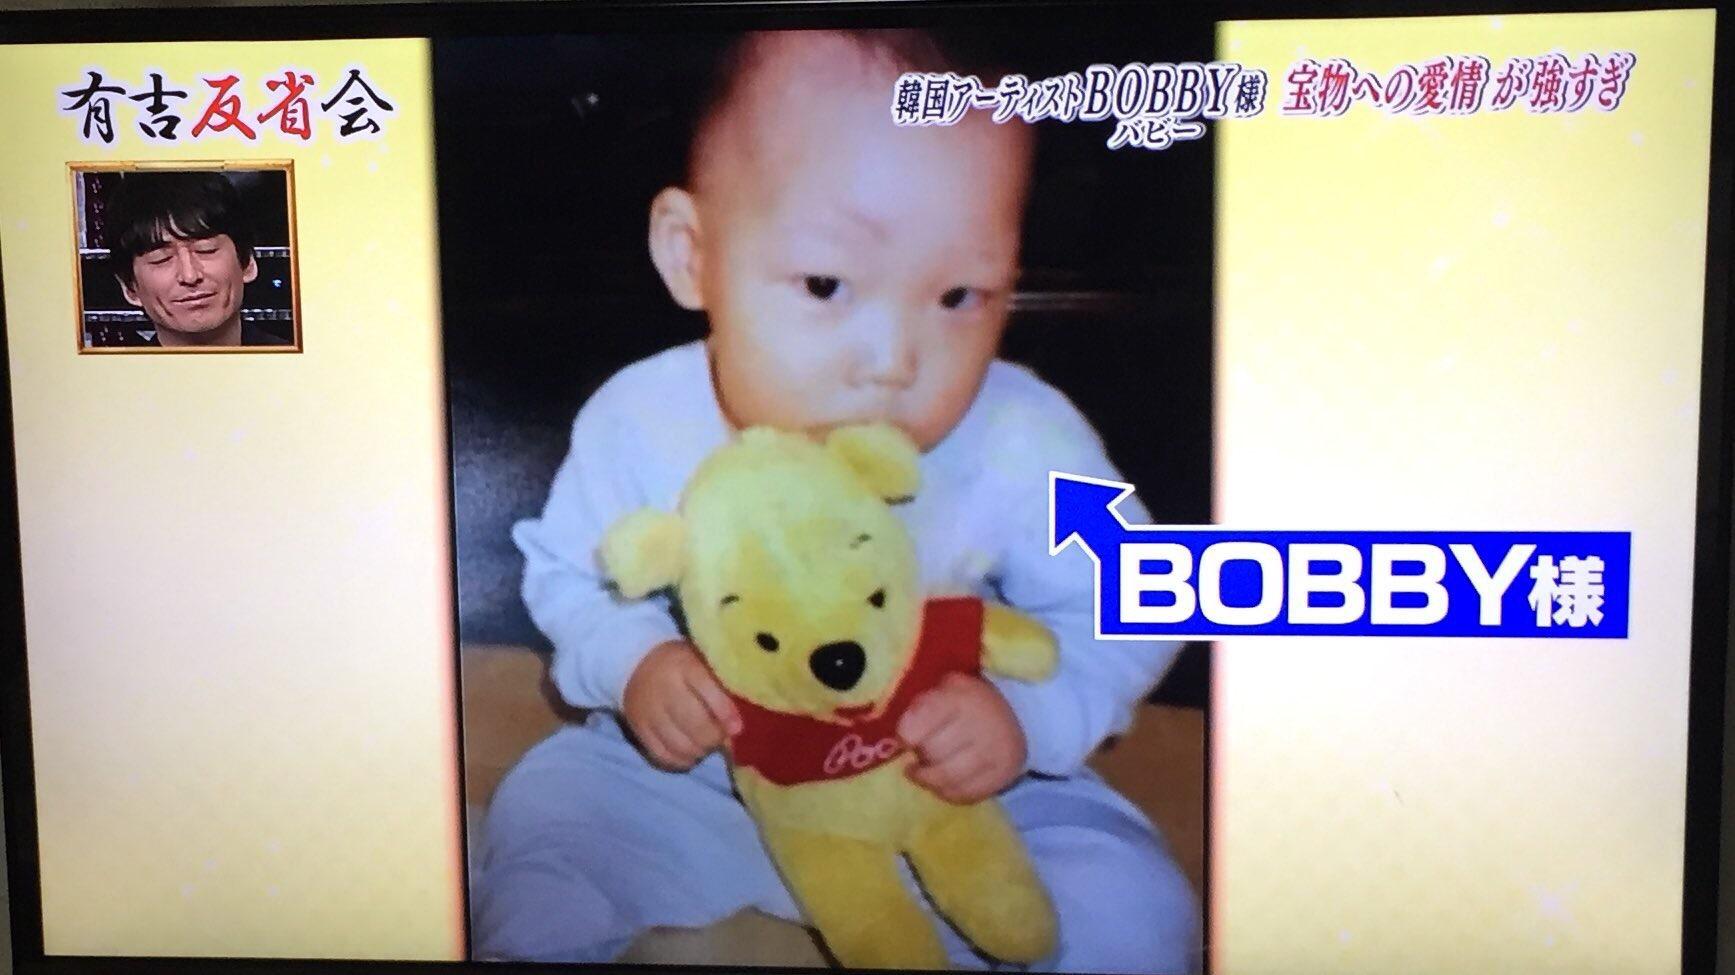 BOBBY画像